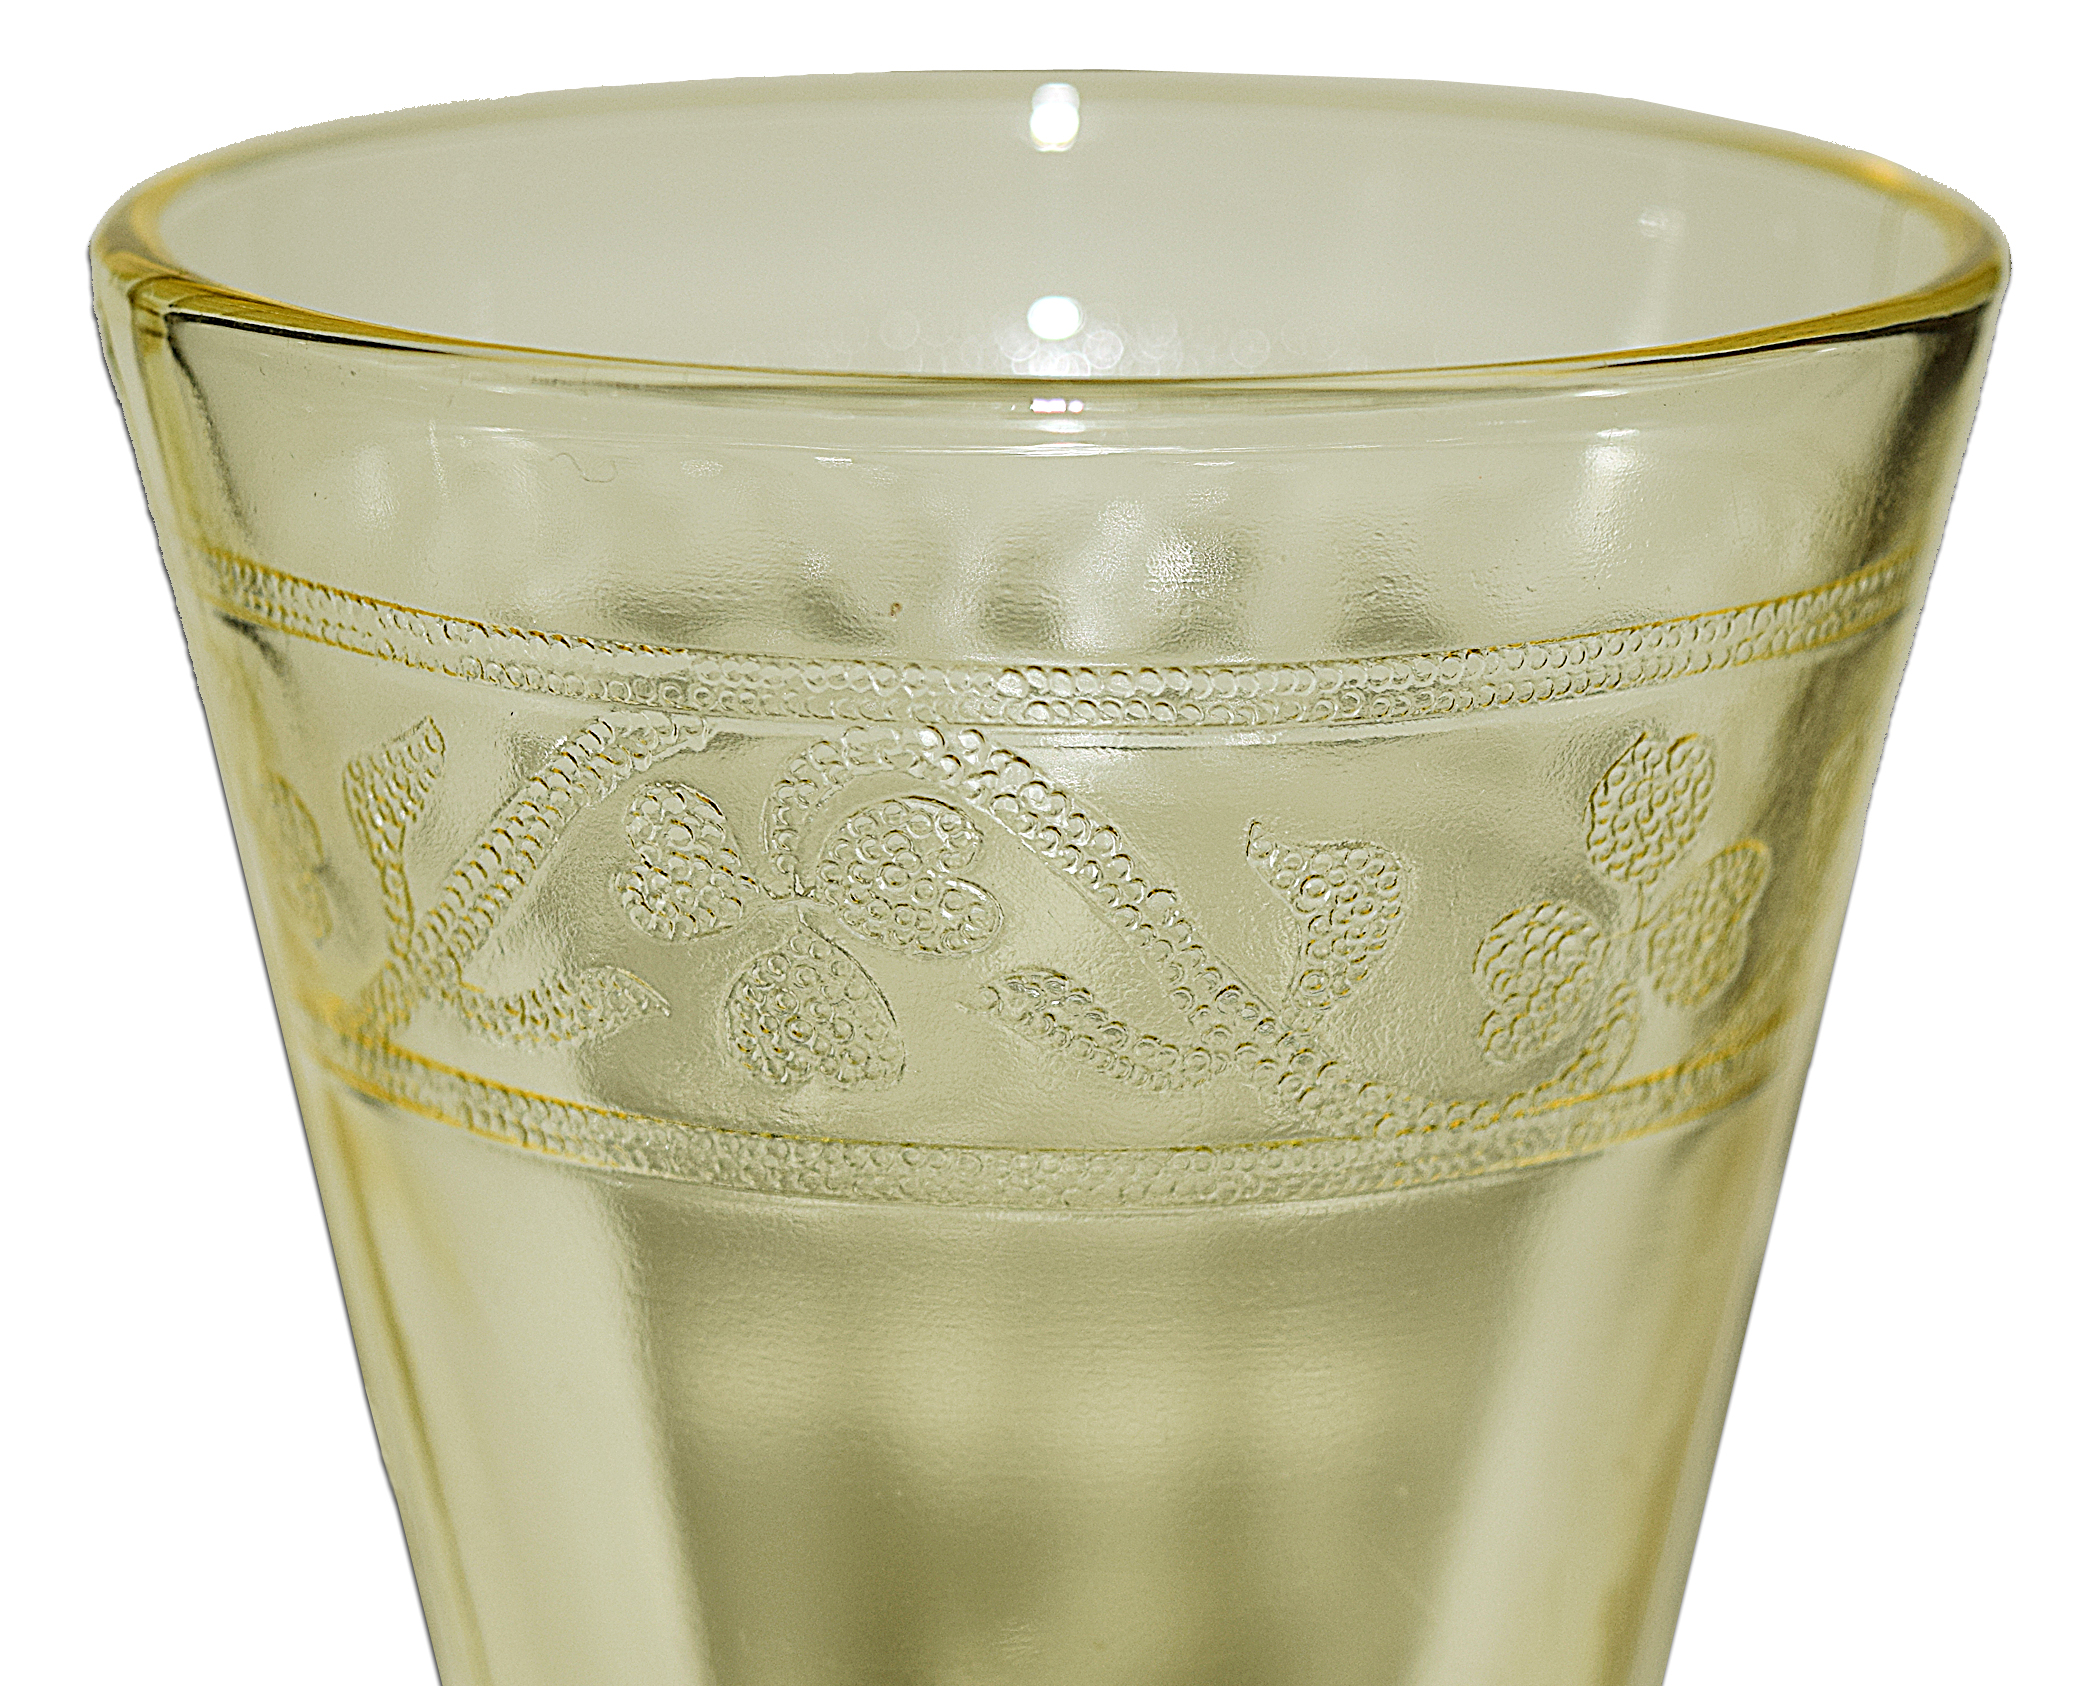 Hazel Atlas Cloverleaf Footed Ice Tea Tumbler Pattern Close Up